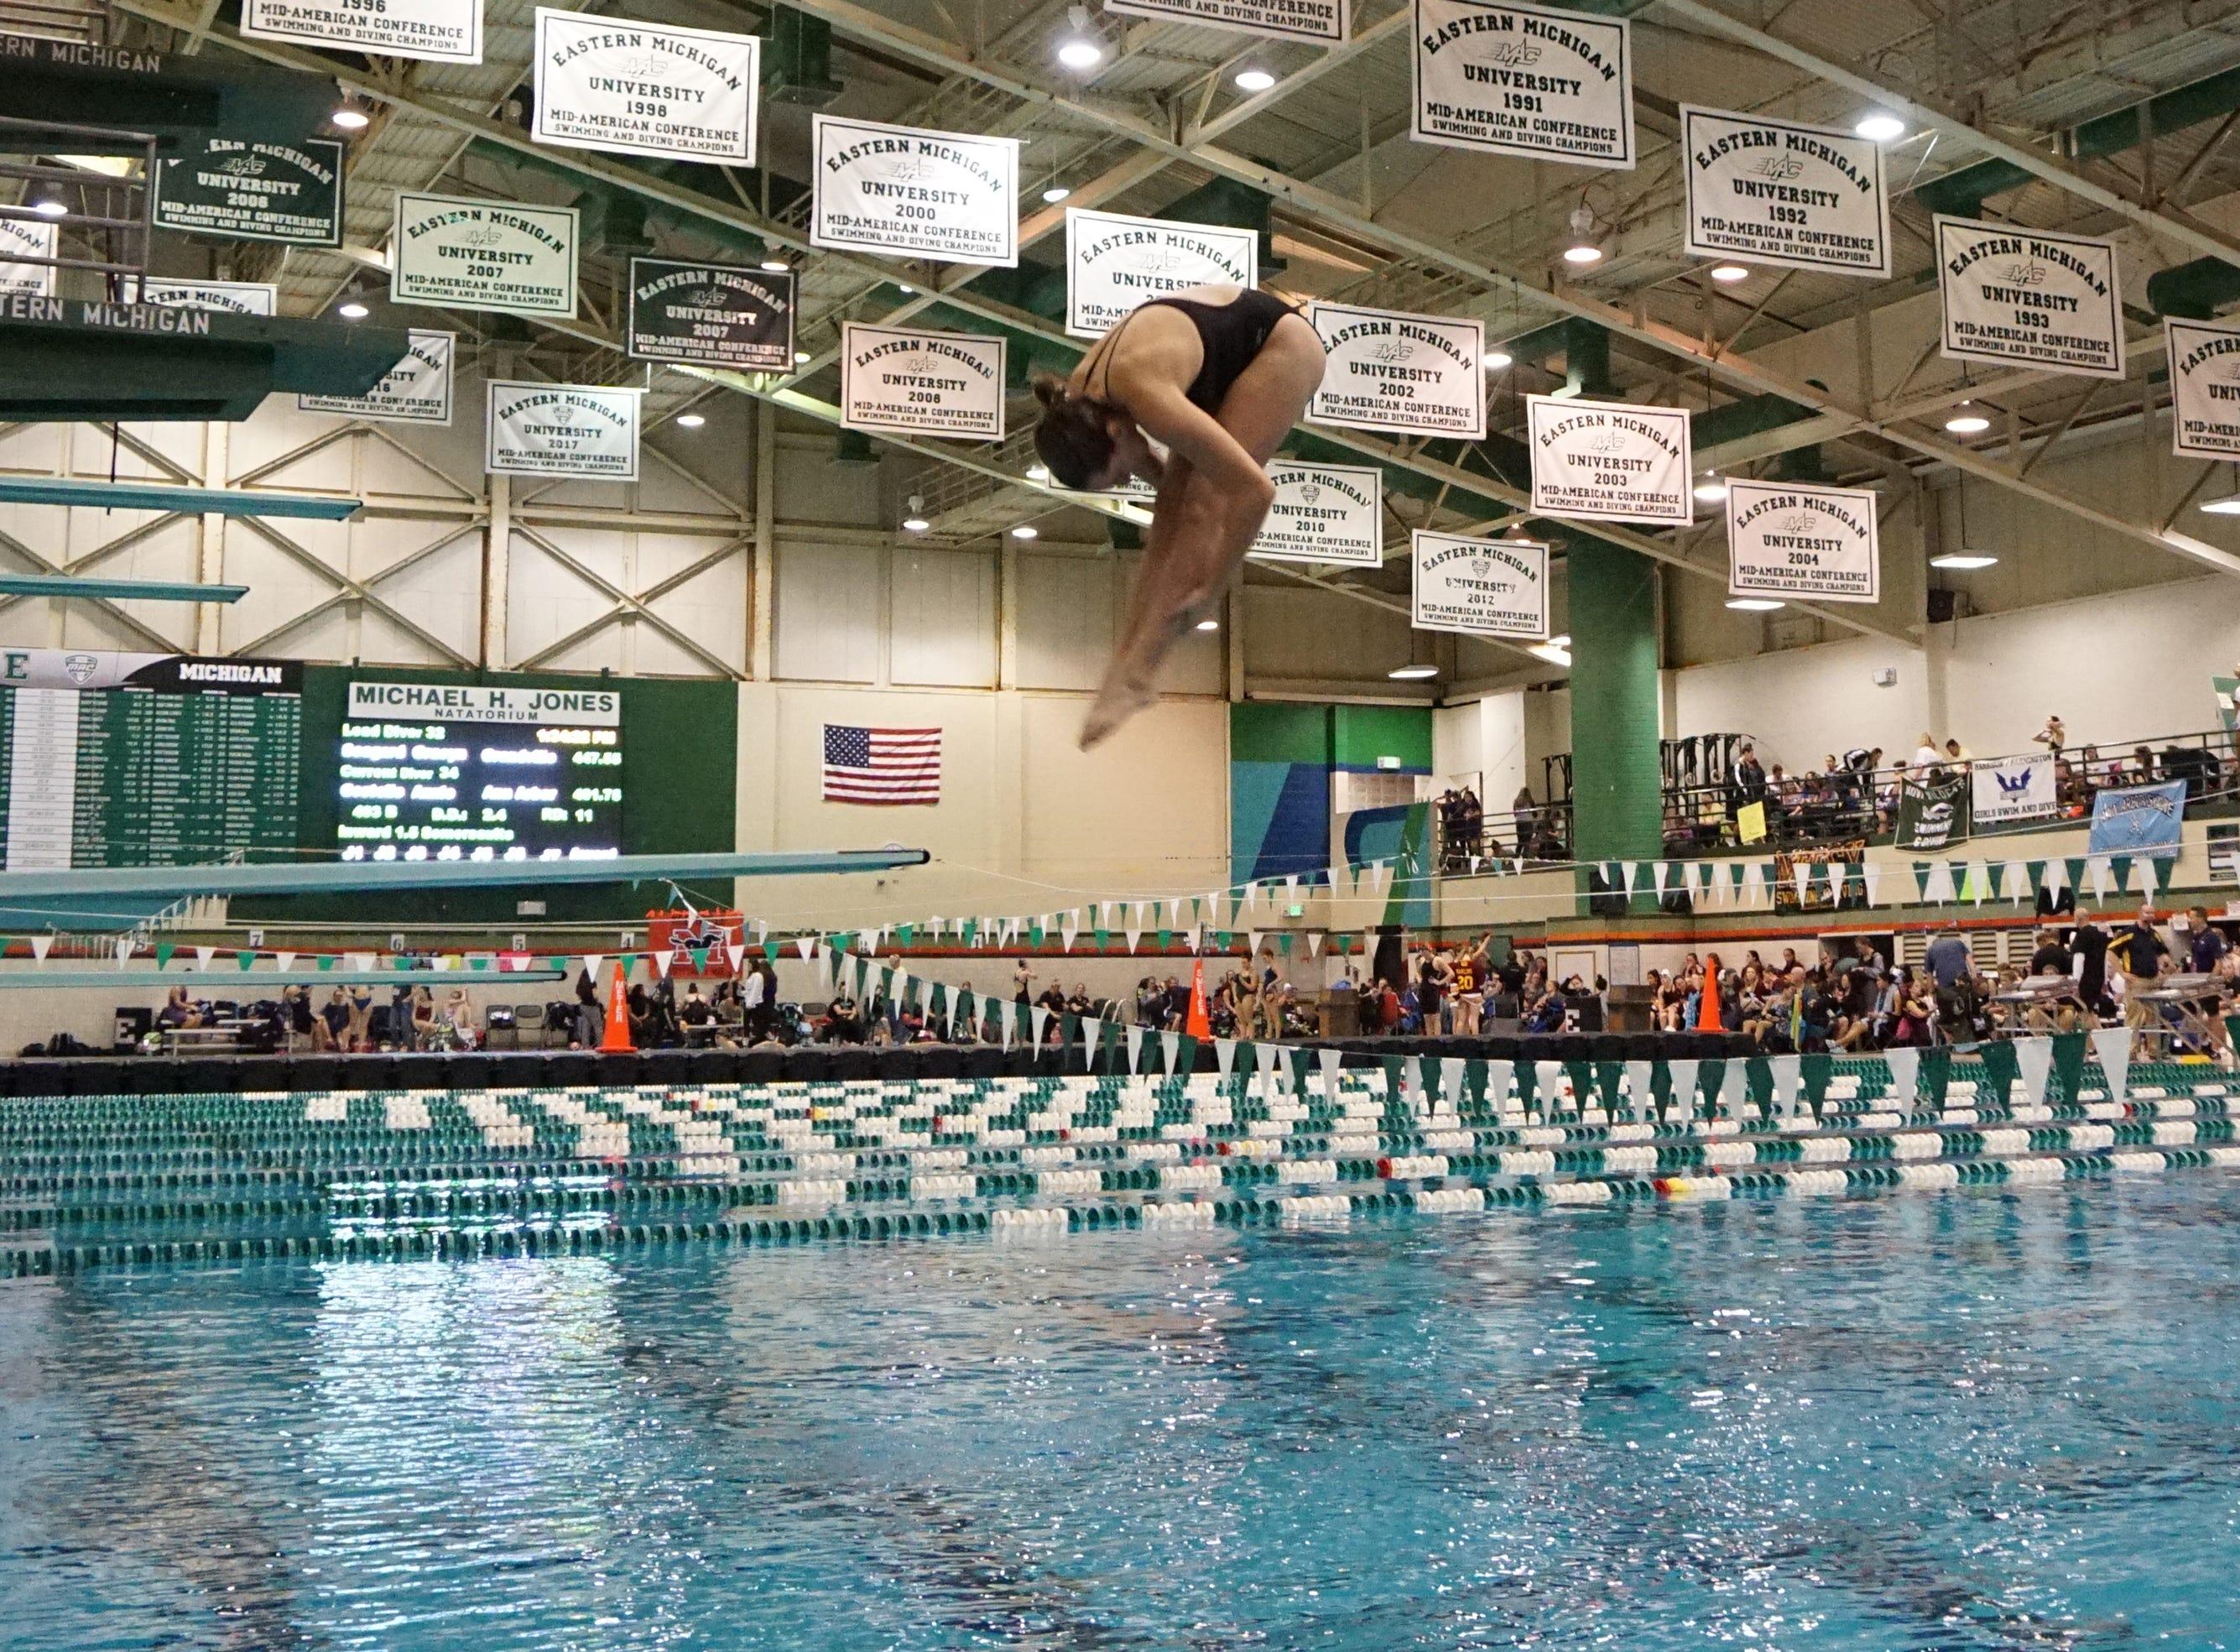 Diving finals at the Division 1 girls swimming and diving championships held at Eastern Michigan University Nov. 17, 2018.